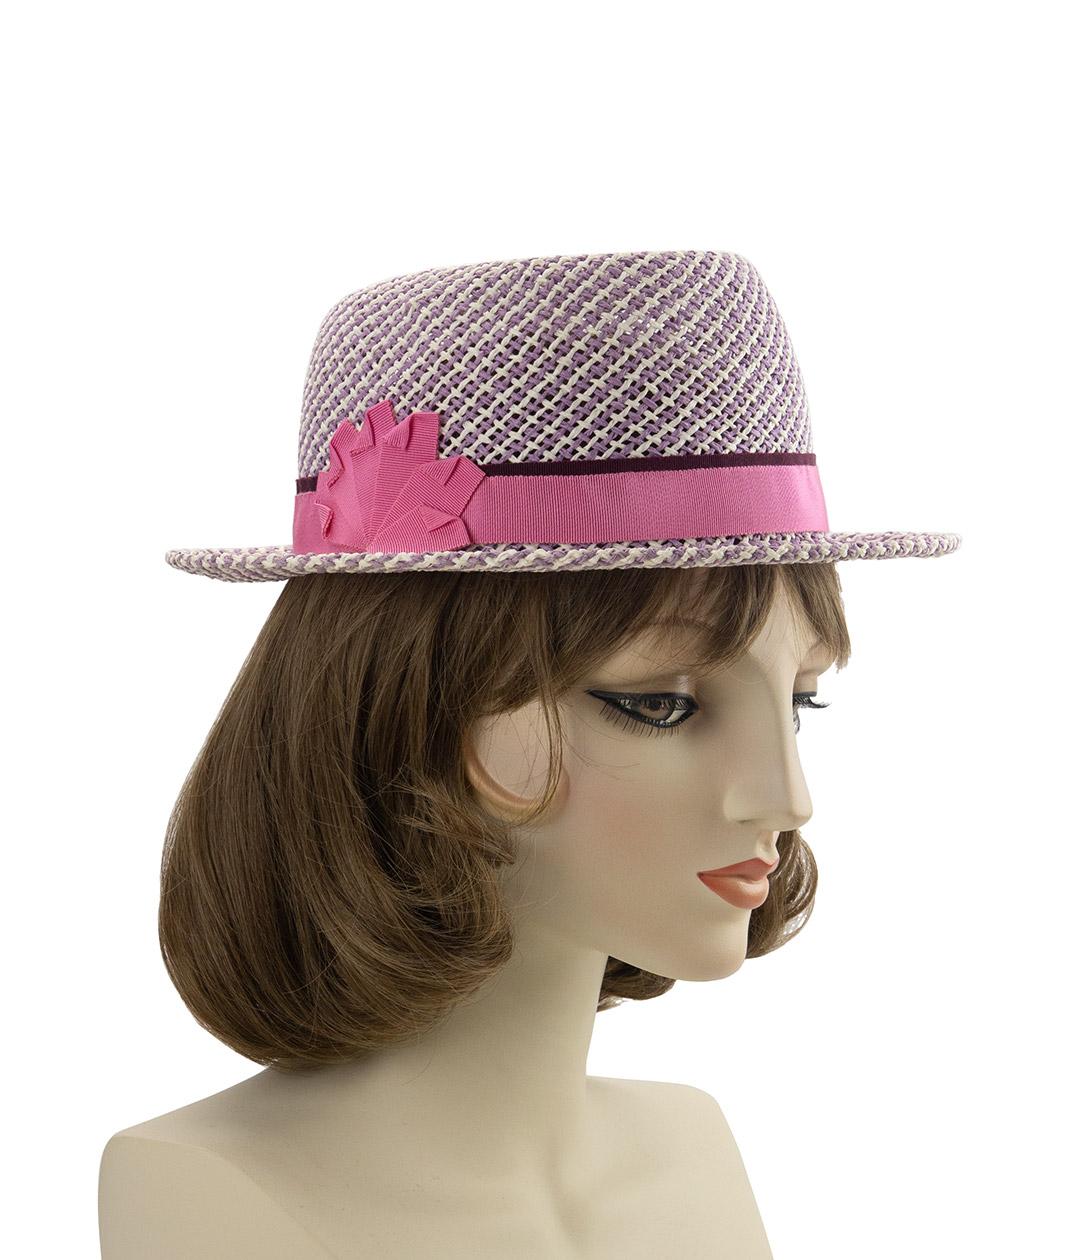 light purple straw hat with pink ribbon trim